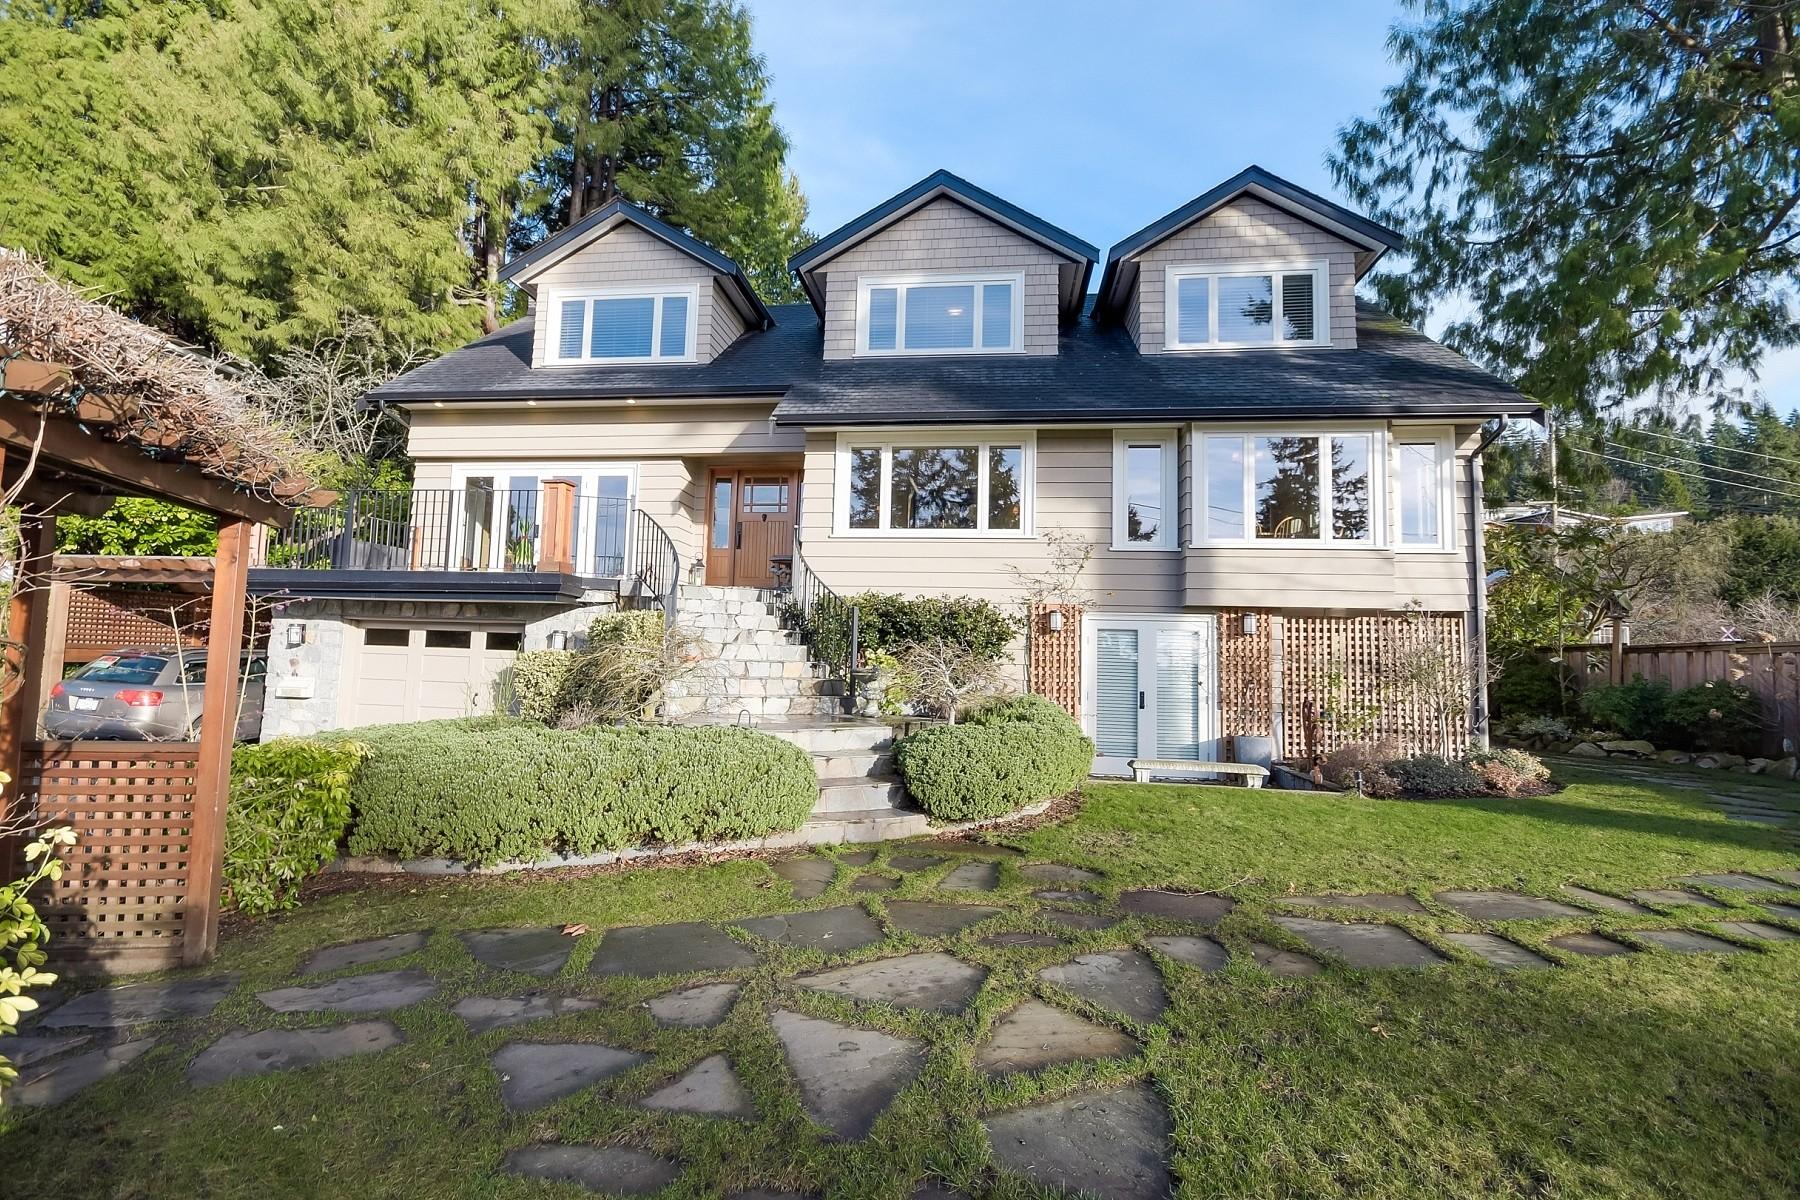 Casa Unifamiliar por un Venta en West Vancouver, Greater Vancouver- Test 3303 Marine Drive West Vancouver, British Columbia V7V 1M8 Canadá